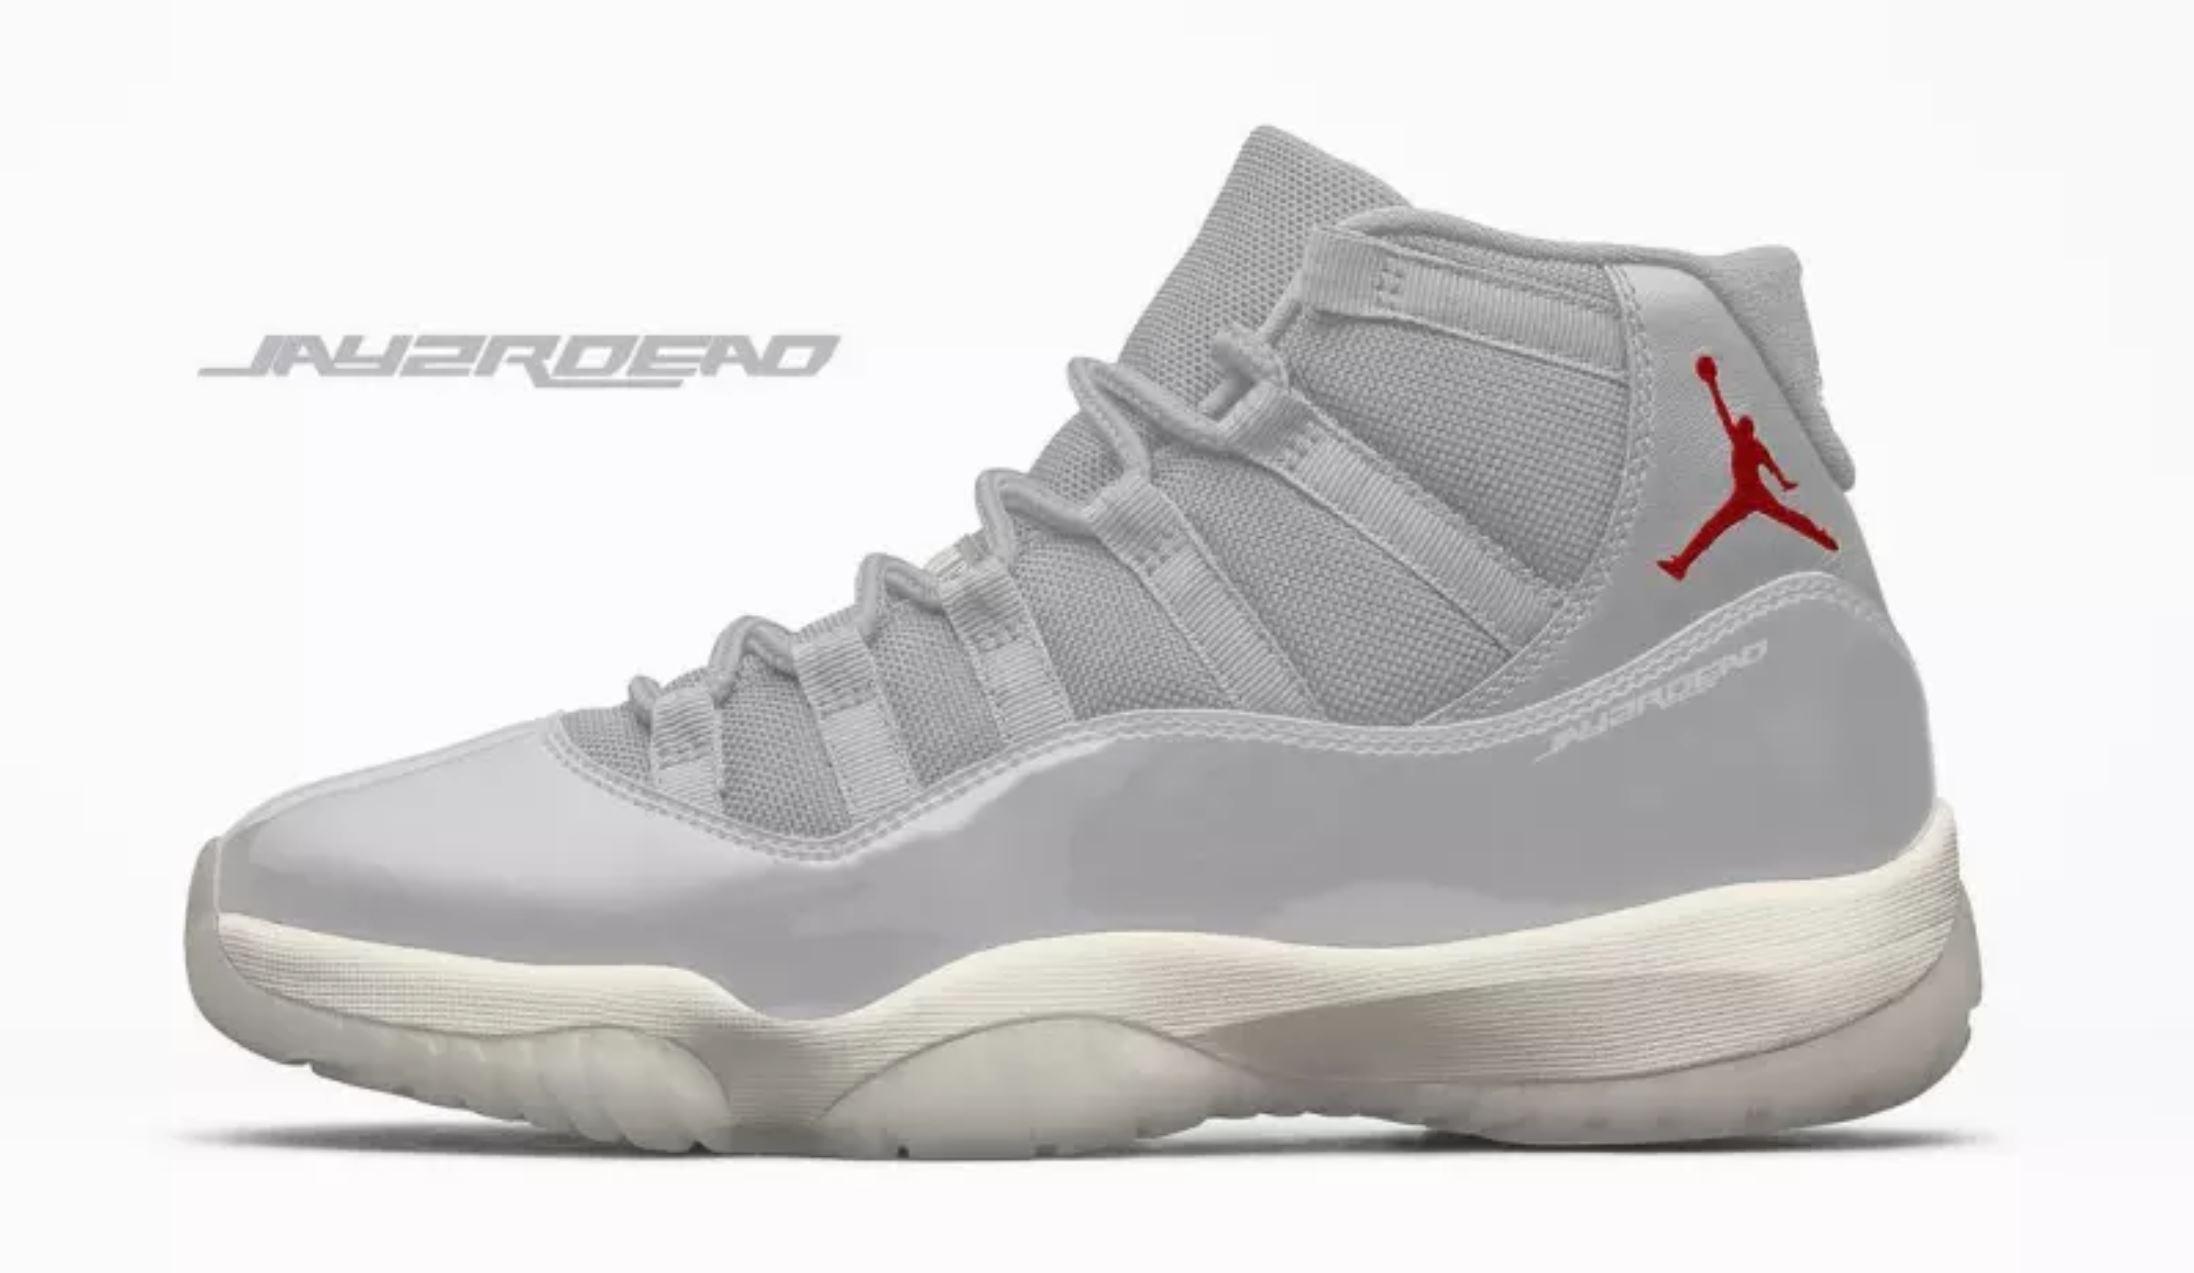 quality design 14ca4 8fe05 New Air Jordan 11 'Platinum Tint' Leaks Online - WearTesters